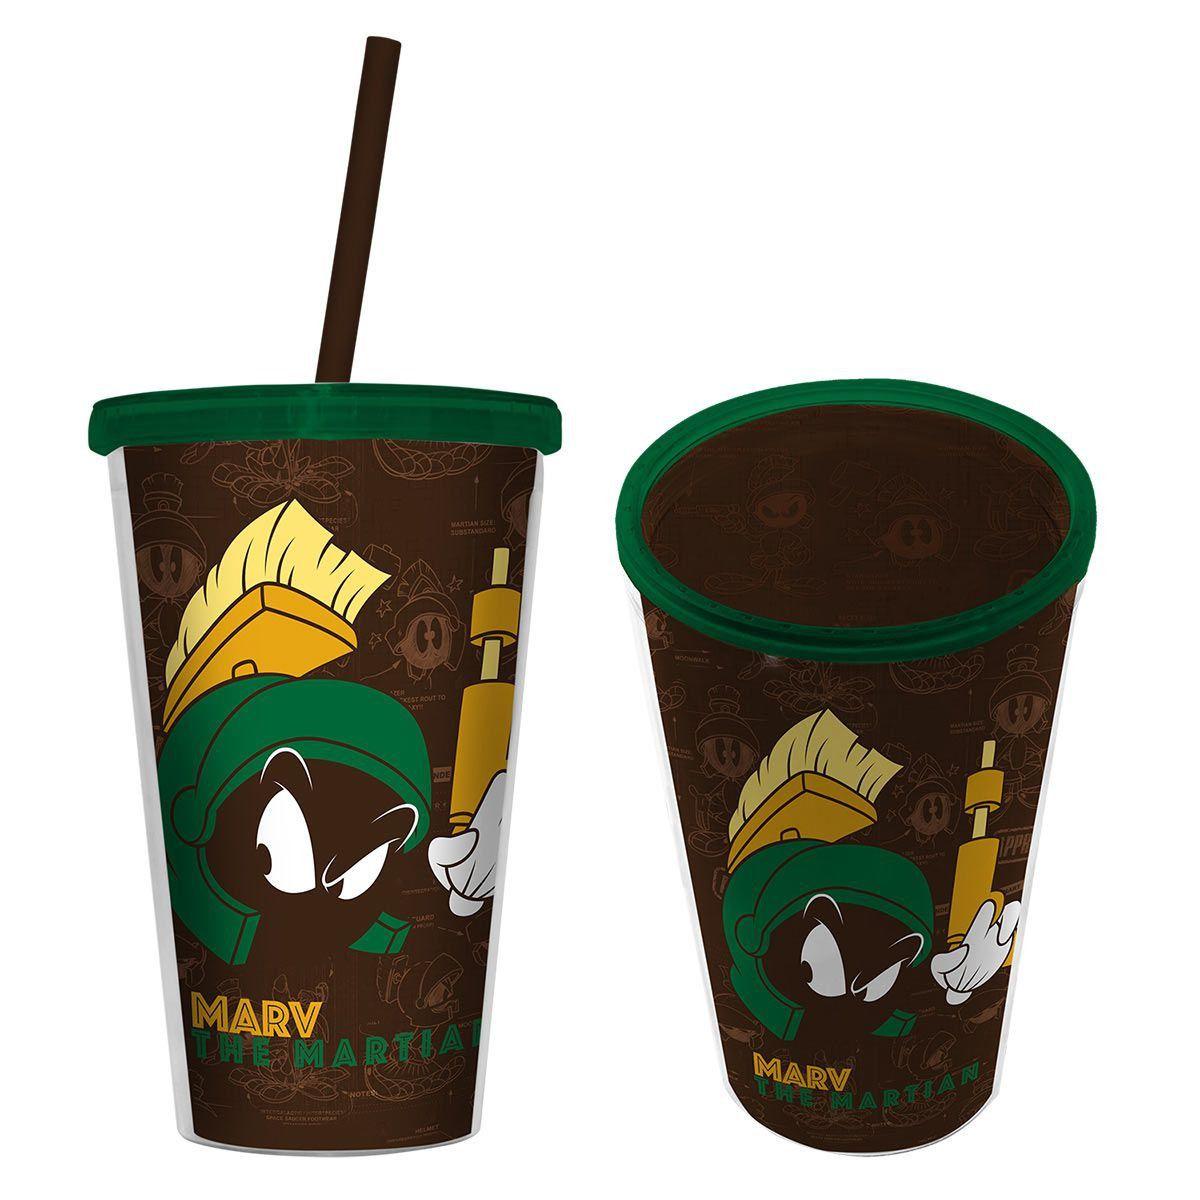 Copo com Tampa e Canuco Looney Tunes Marvin, O Marciano  - bandUP Store Marketplace